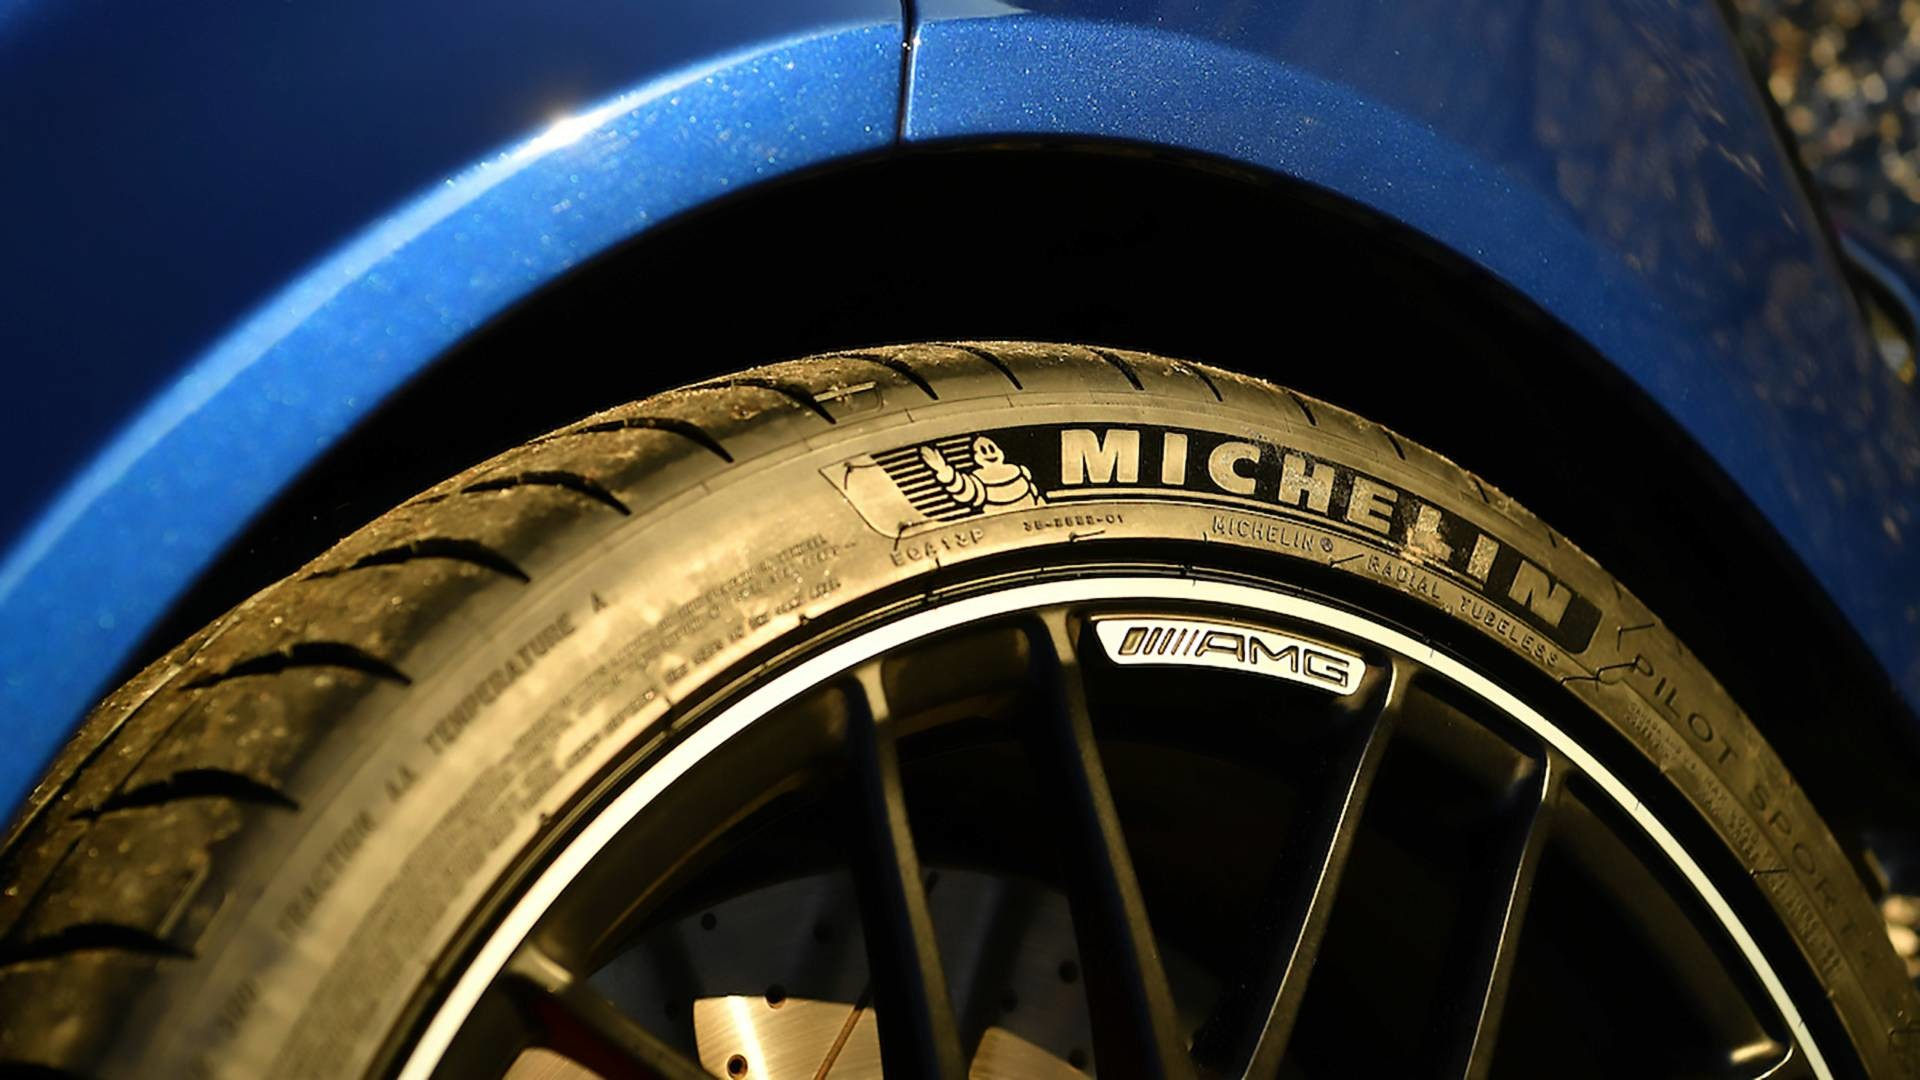 Michelin dá conselhos sobre como prolongar a vida útil dos pneus